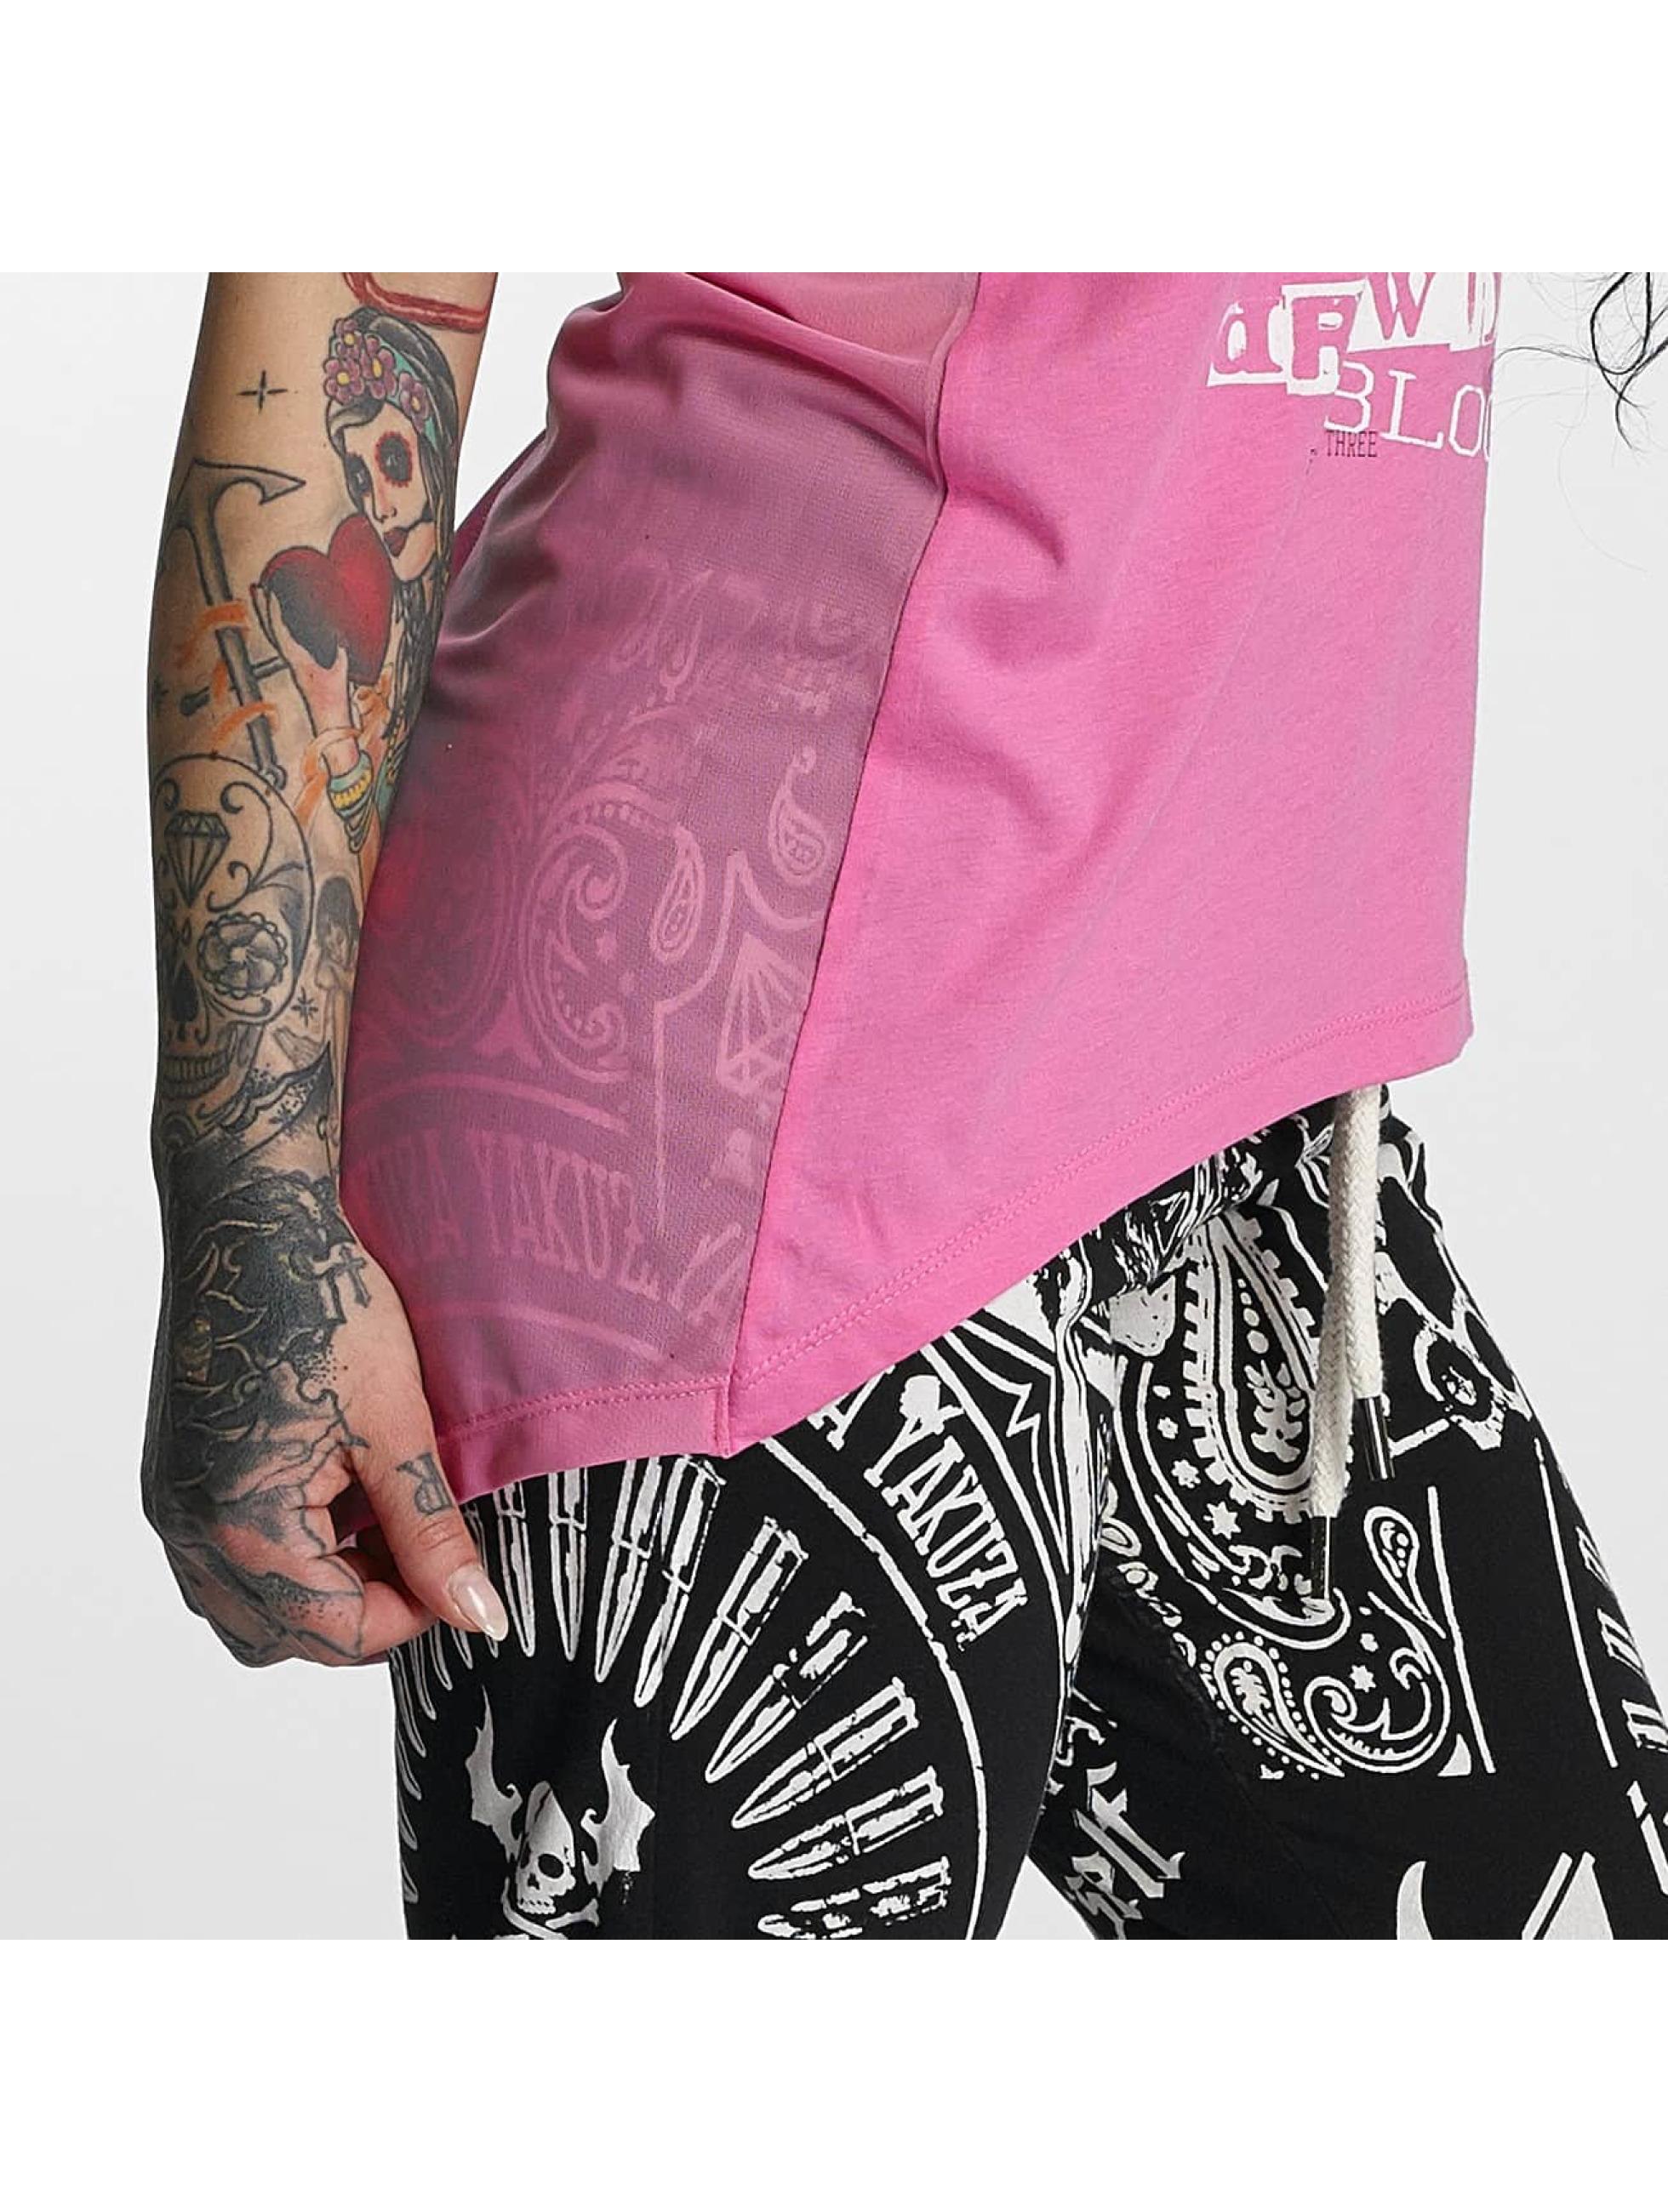 Yakuza T-Shirt Sharp Knife Limpid pink